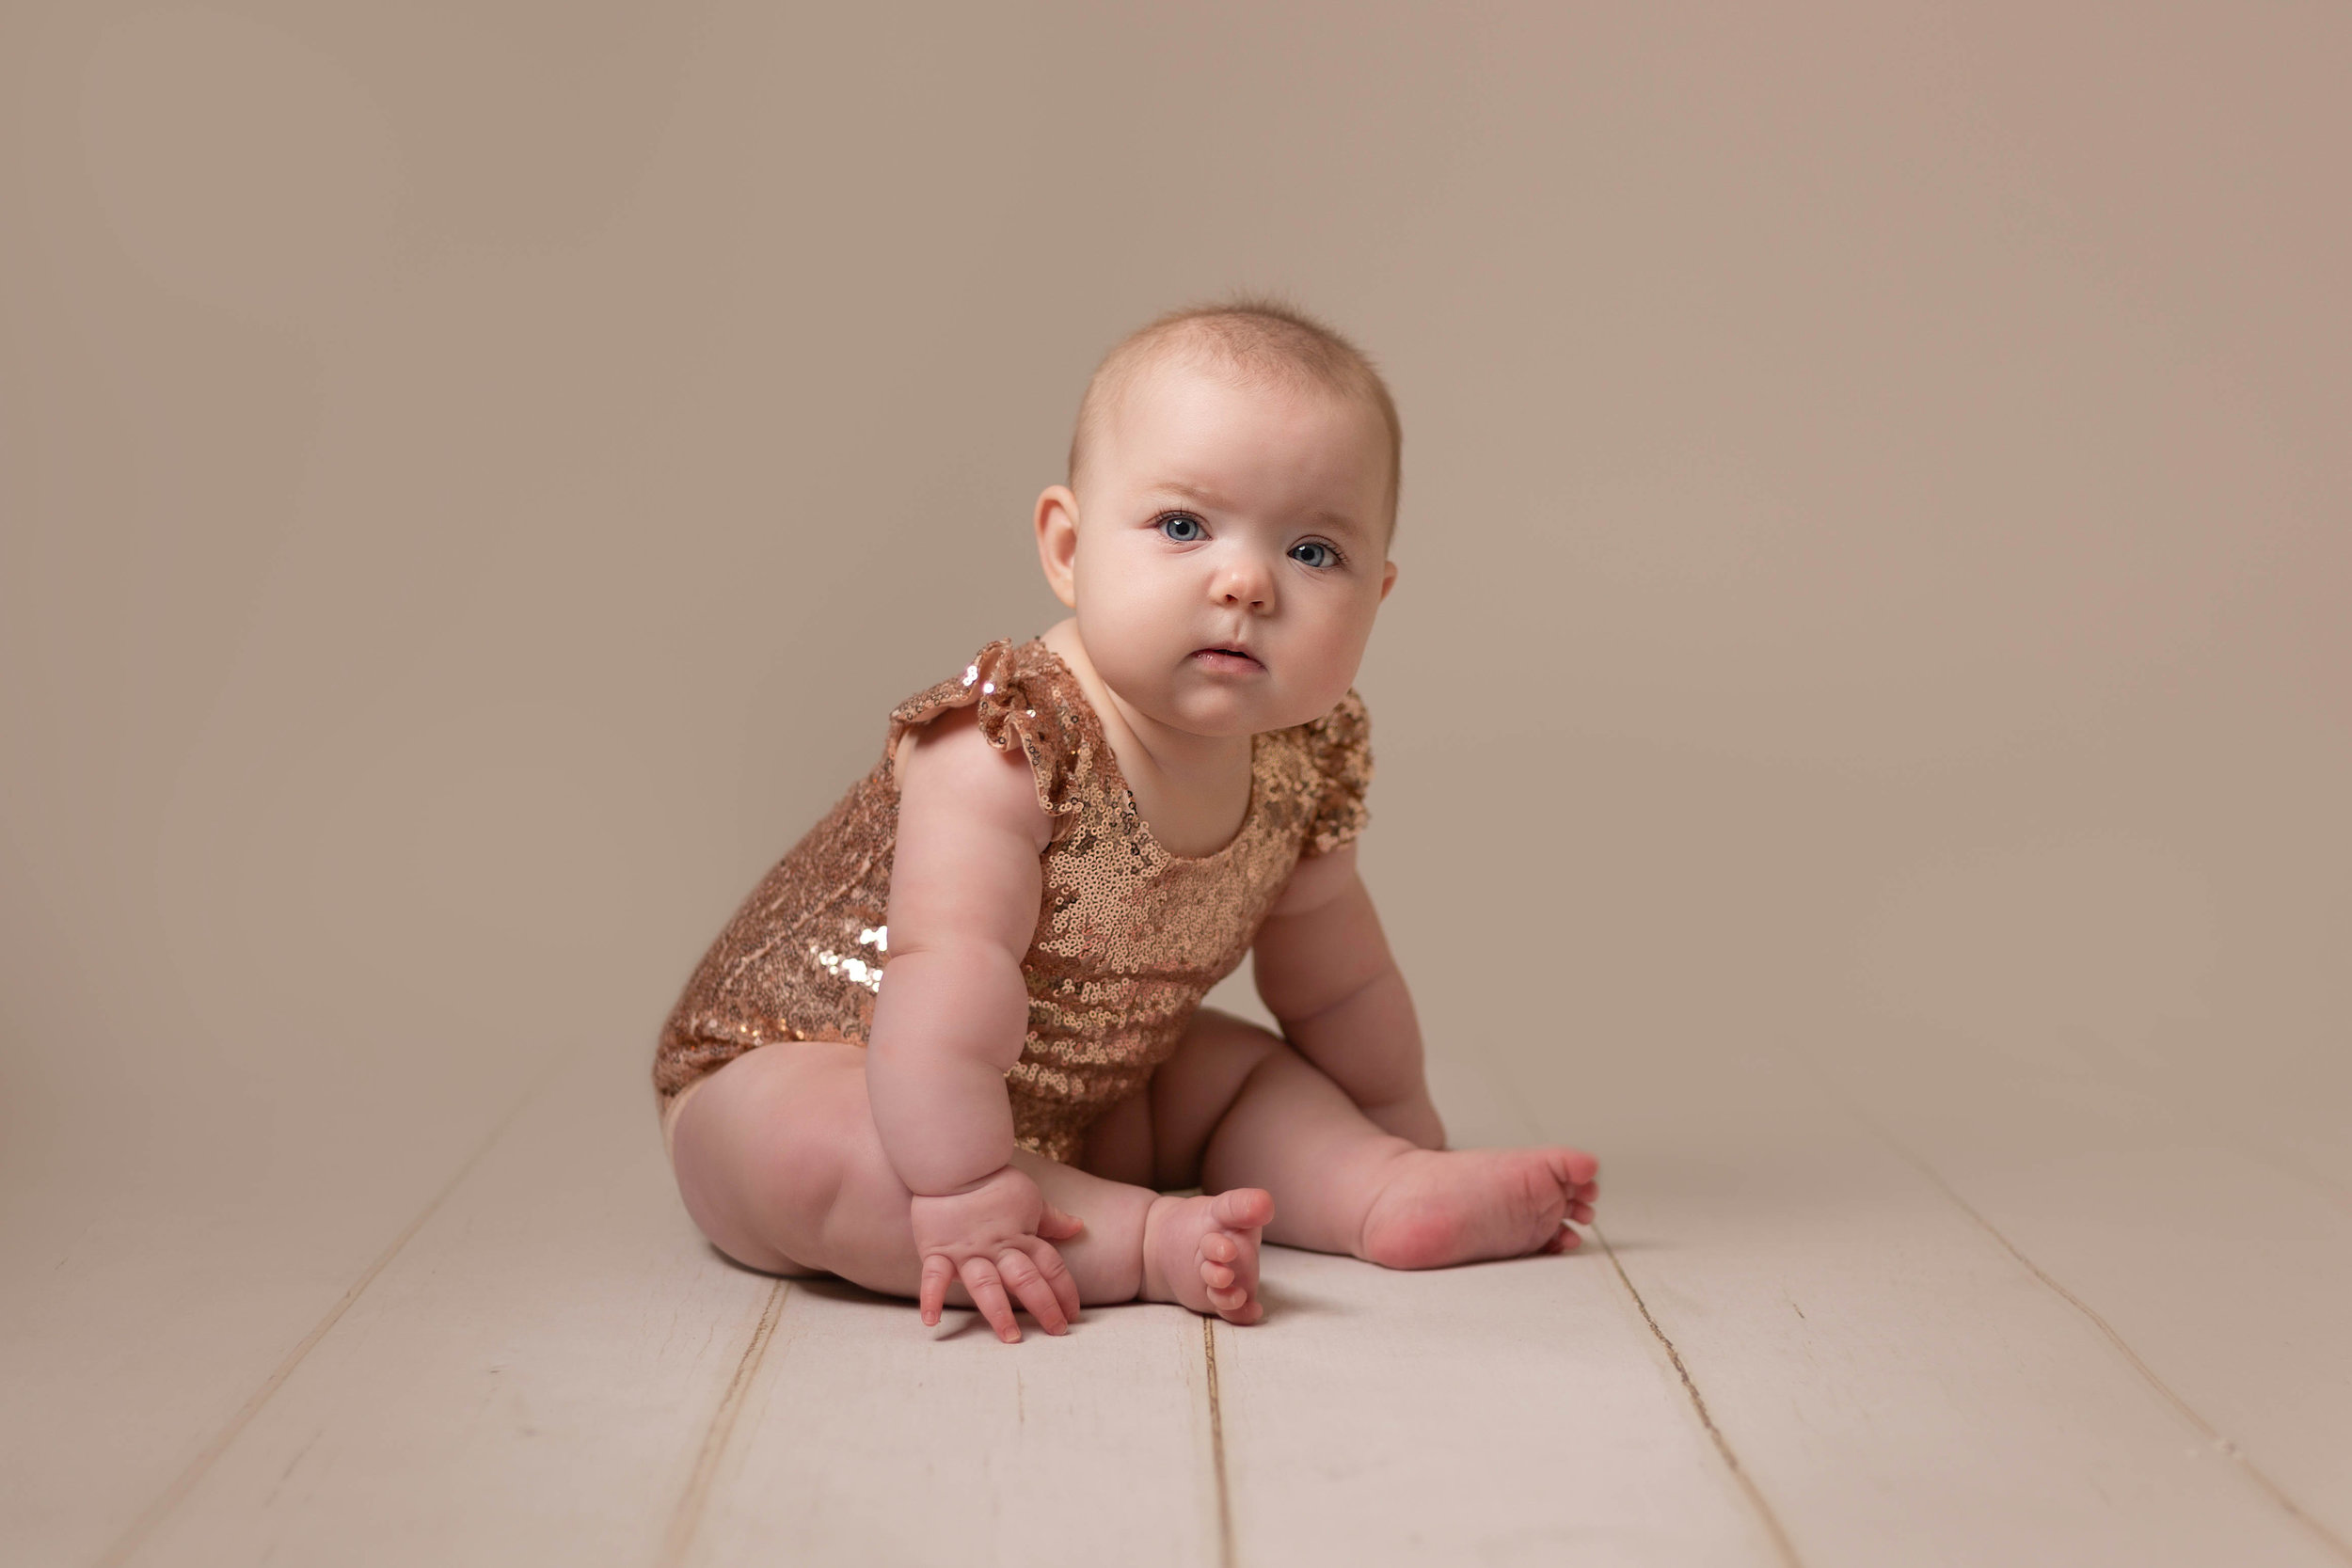 LEA-COOPER-PHOTOGRAPHY-CHILD-PHOTOGRAPHY-WILLENHALL-CHILDREN-PHOTOGRAPHER-WOLVERHAMPTON-BILSTON-WEDNESBURY-KIDS-PHOTOGRAPHER-SITTER-SESSION-MILESTONE--6.JPG